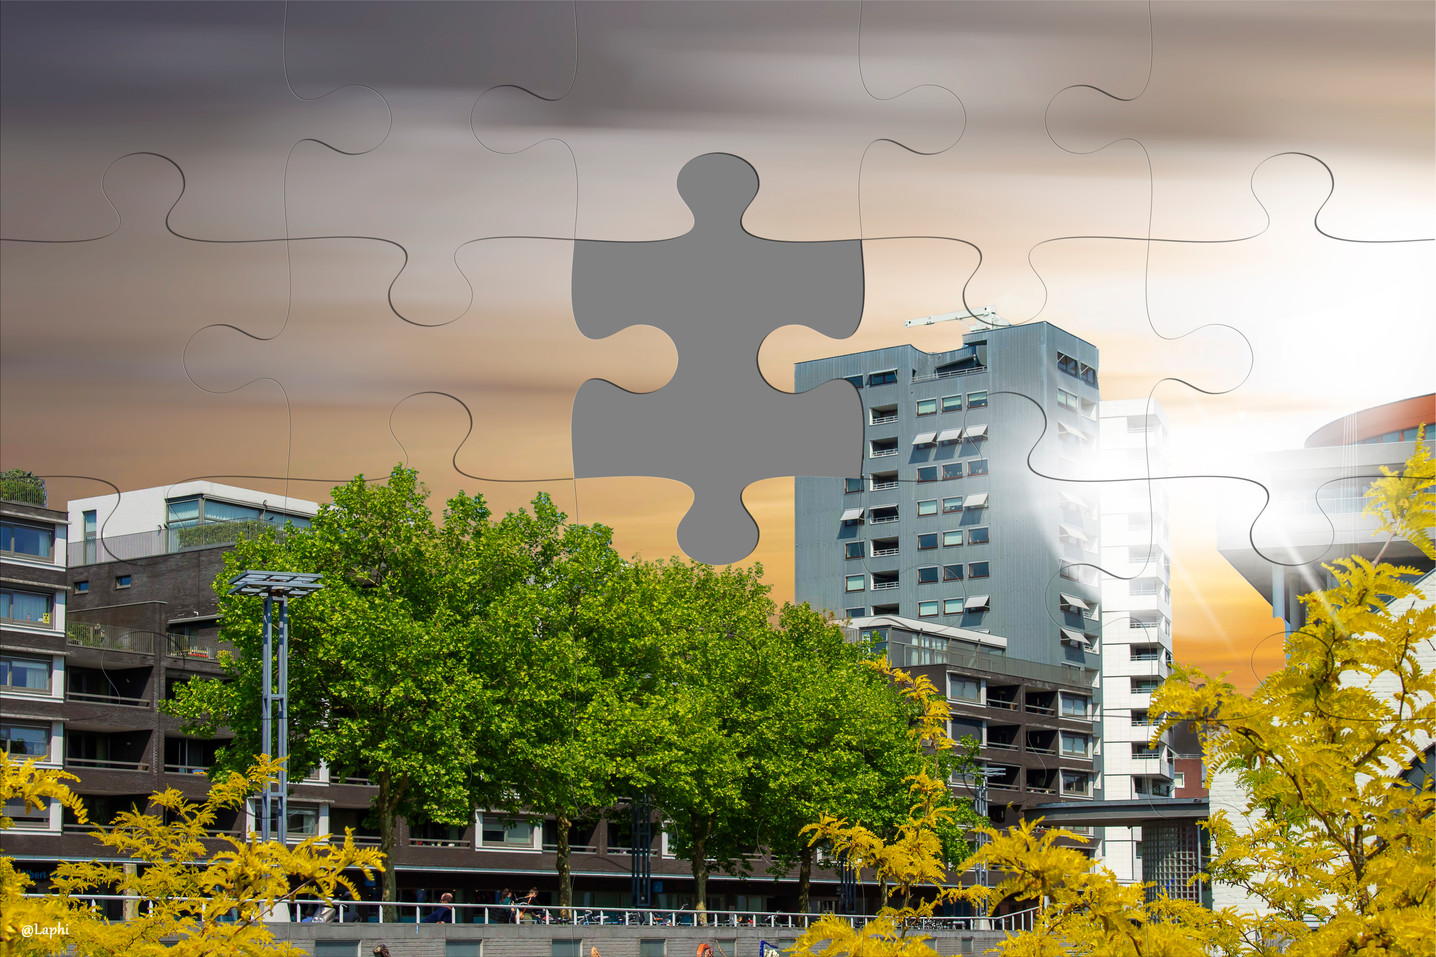 DSC_4377-HDRab puzzle.jpg